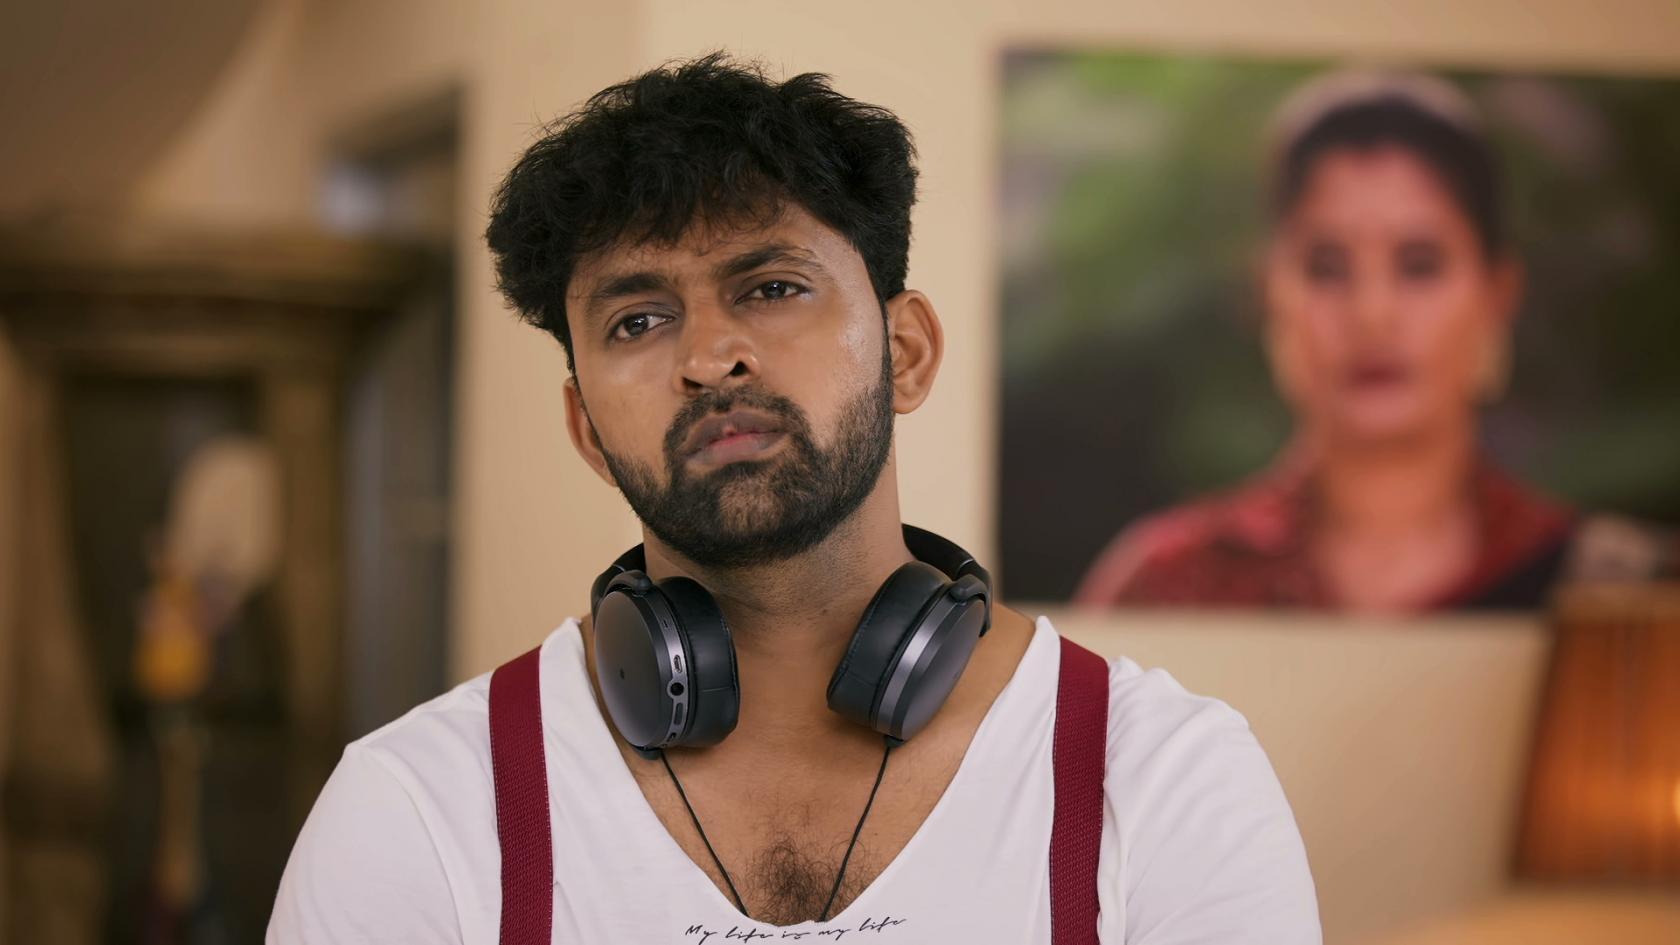 Watch Idhayathai Thirudathey Season 1 Full Episode 243 - 21 Dec 2020 Online for Free on JioCinema.com